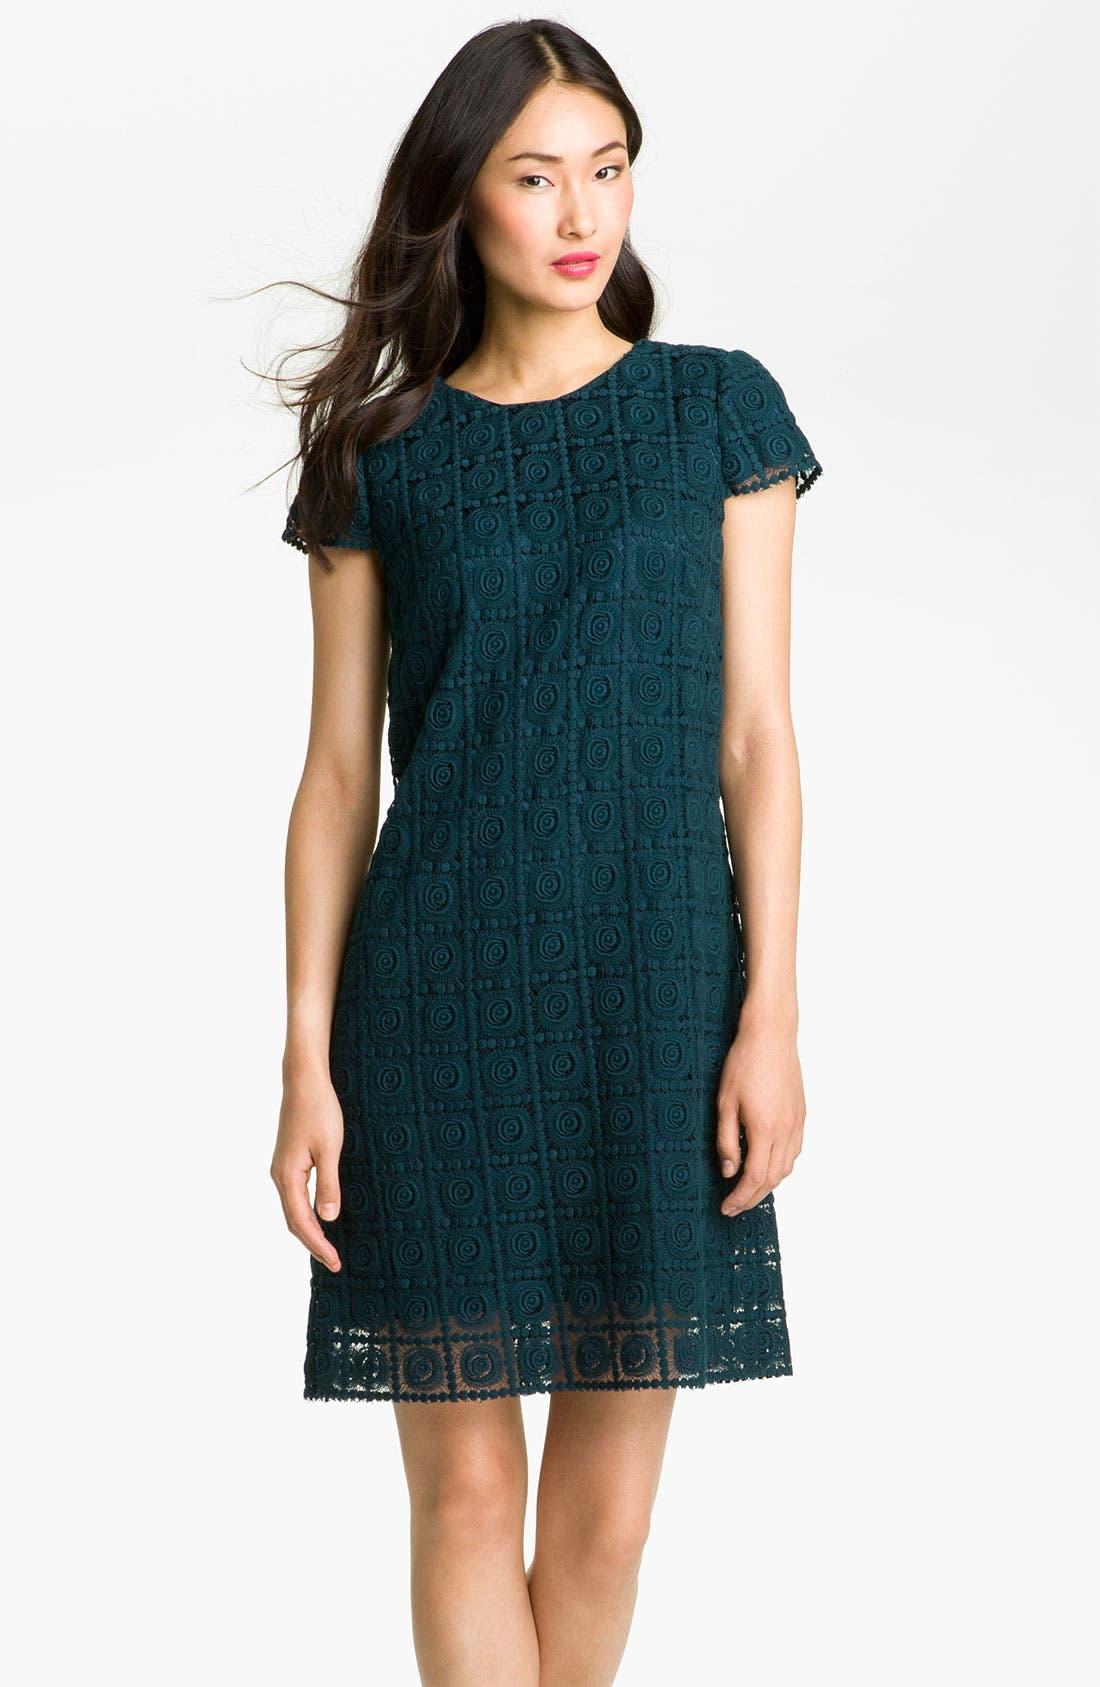 Main Image - Suzi Chin for Maggy Boutique Crochet Shift Dress